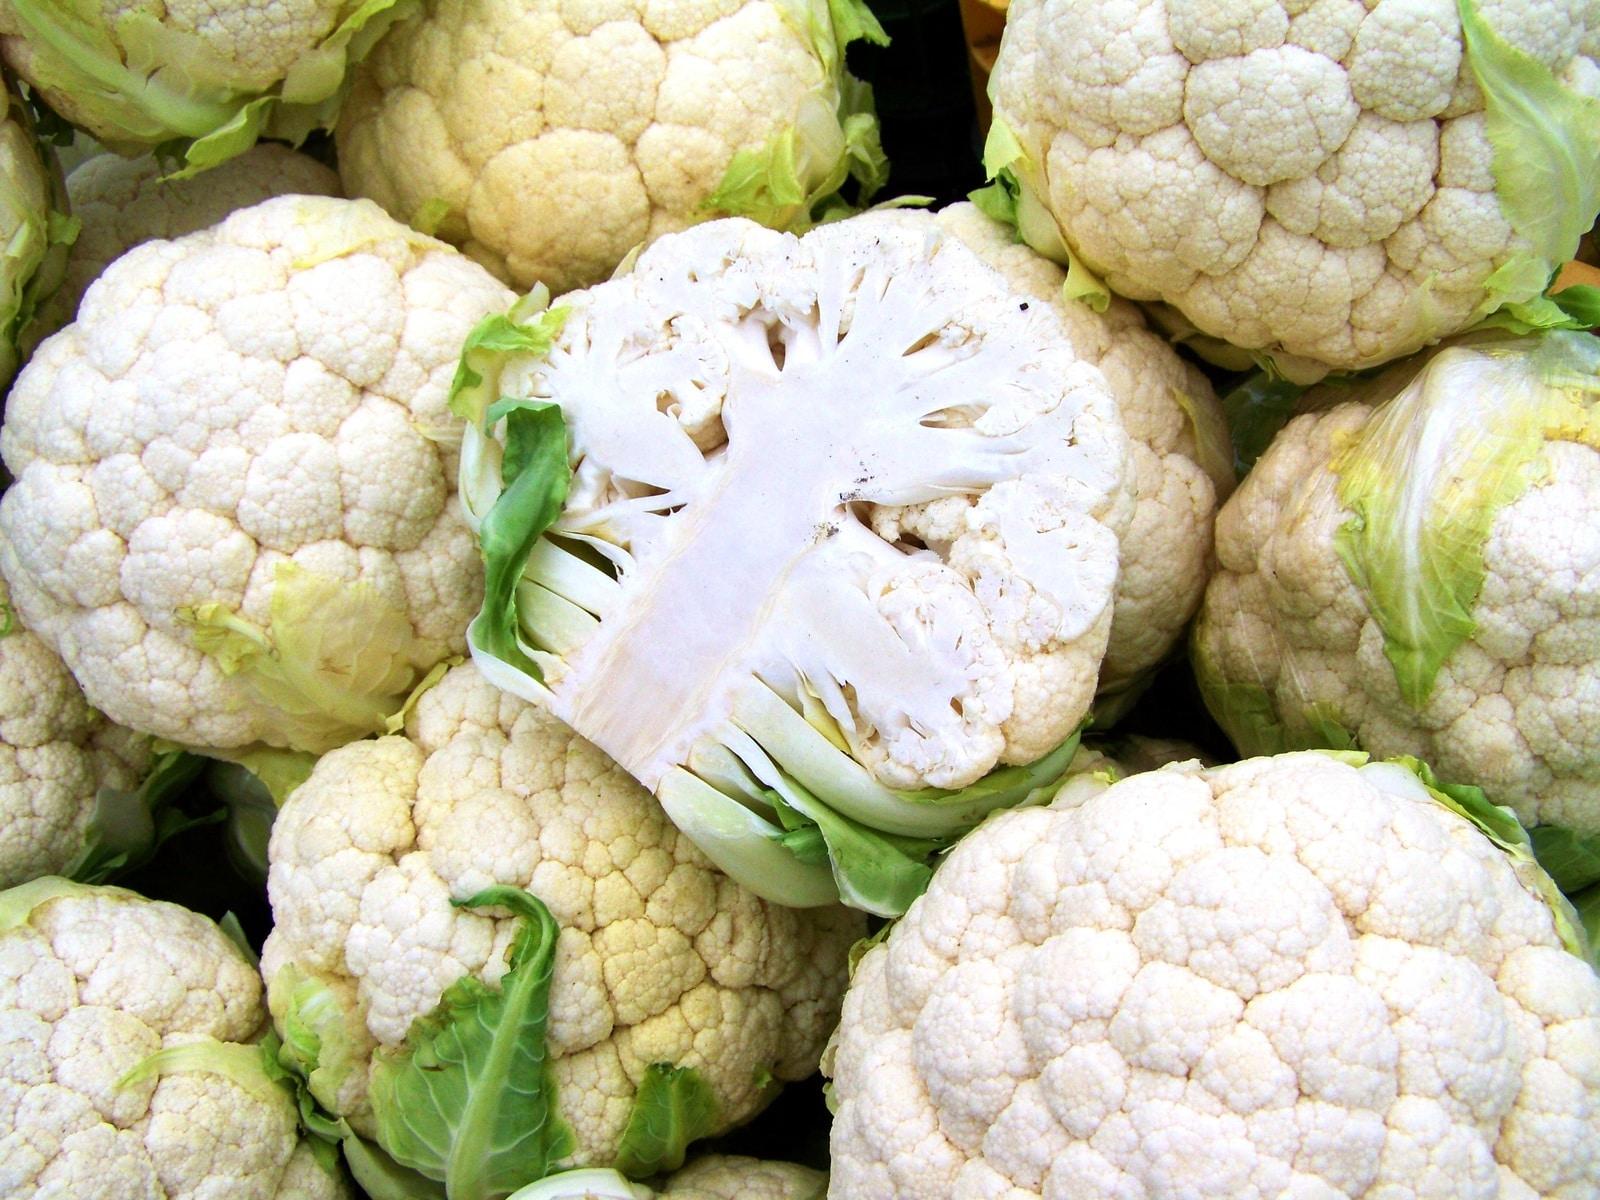 Cauliflower Good For Thyroid